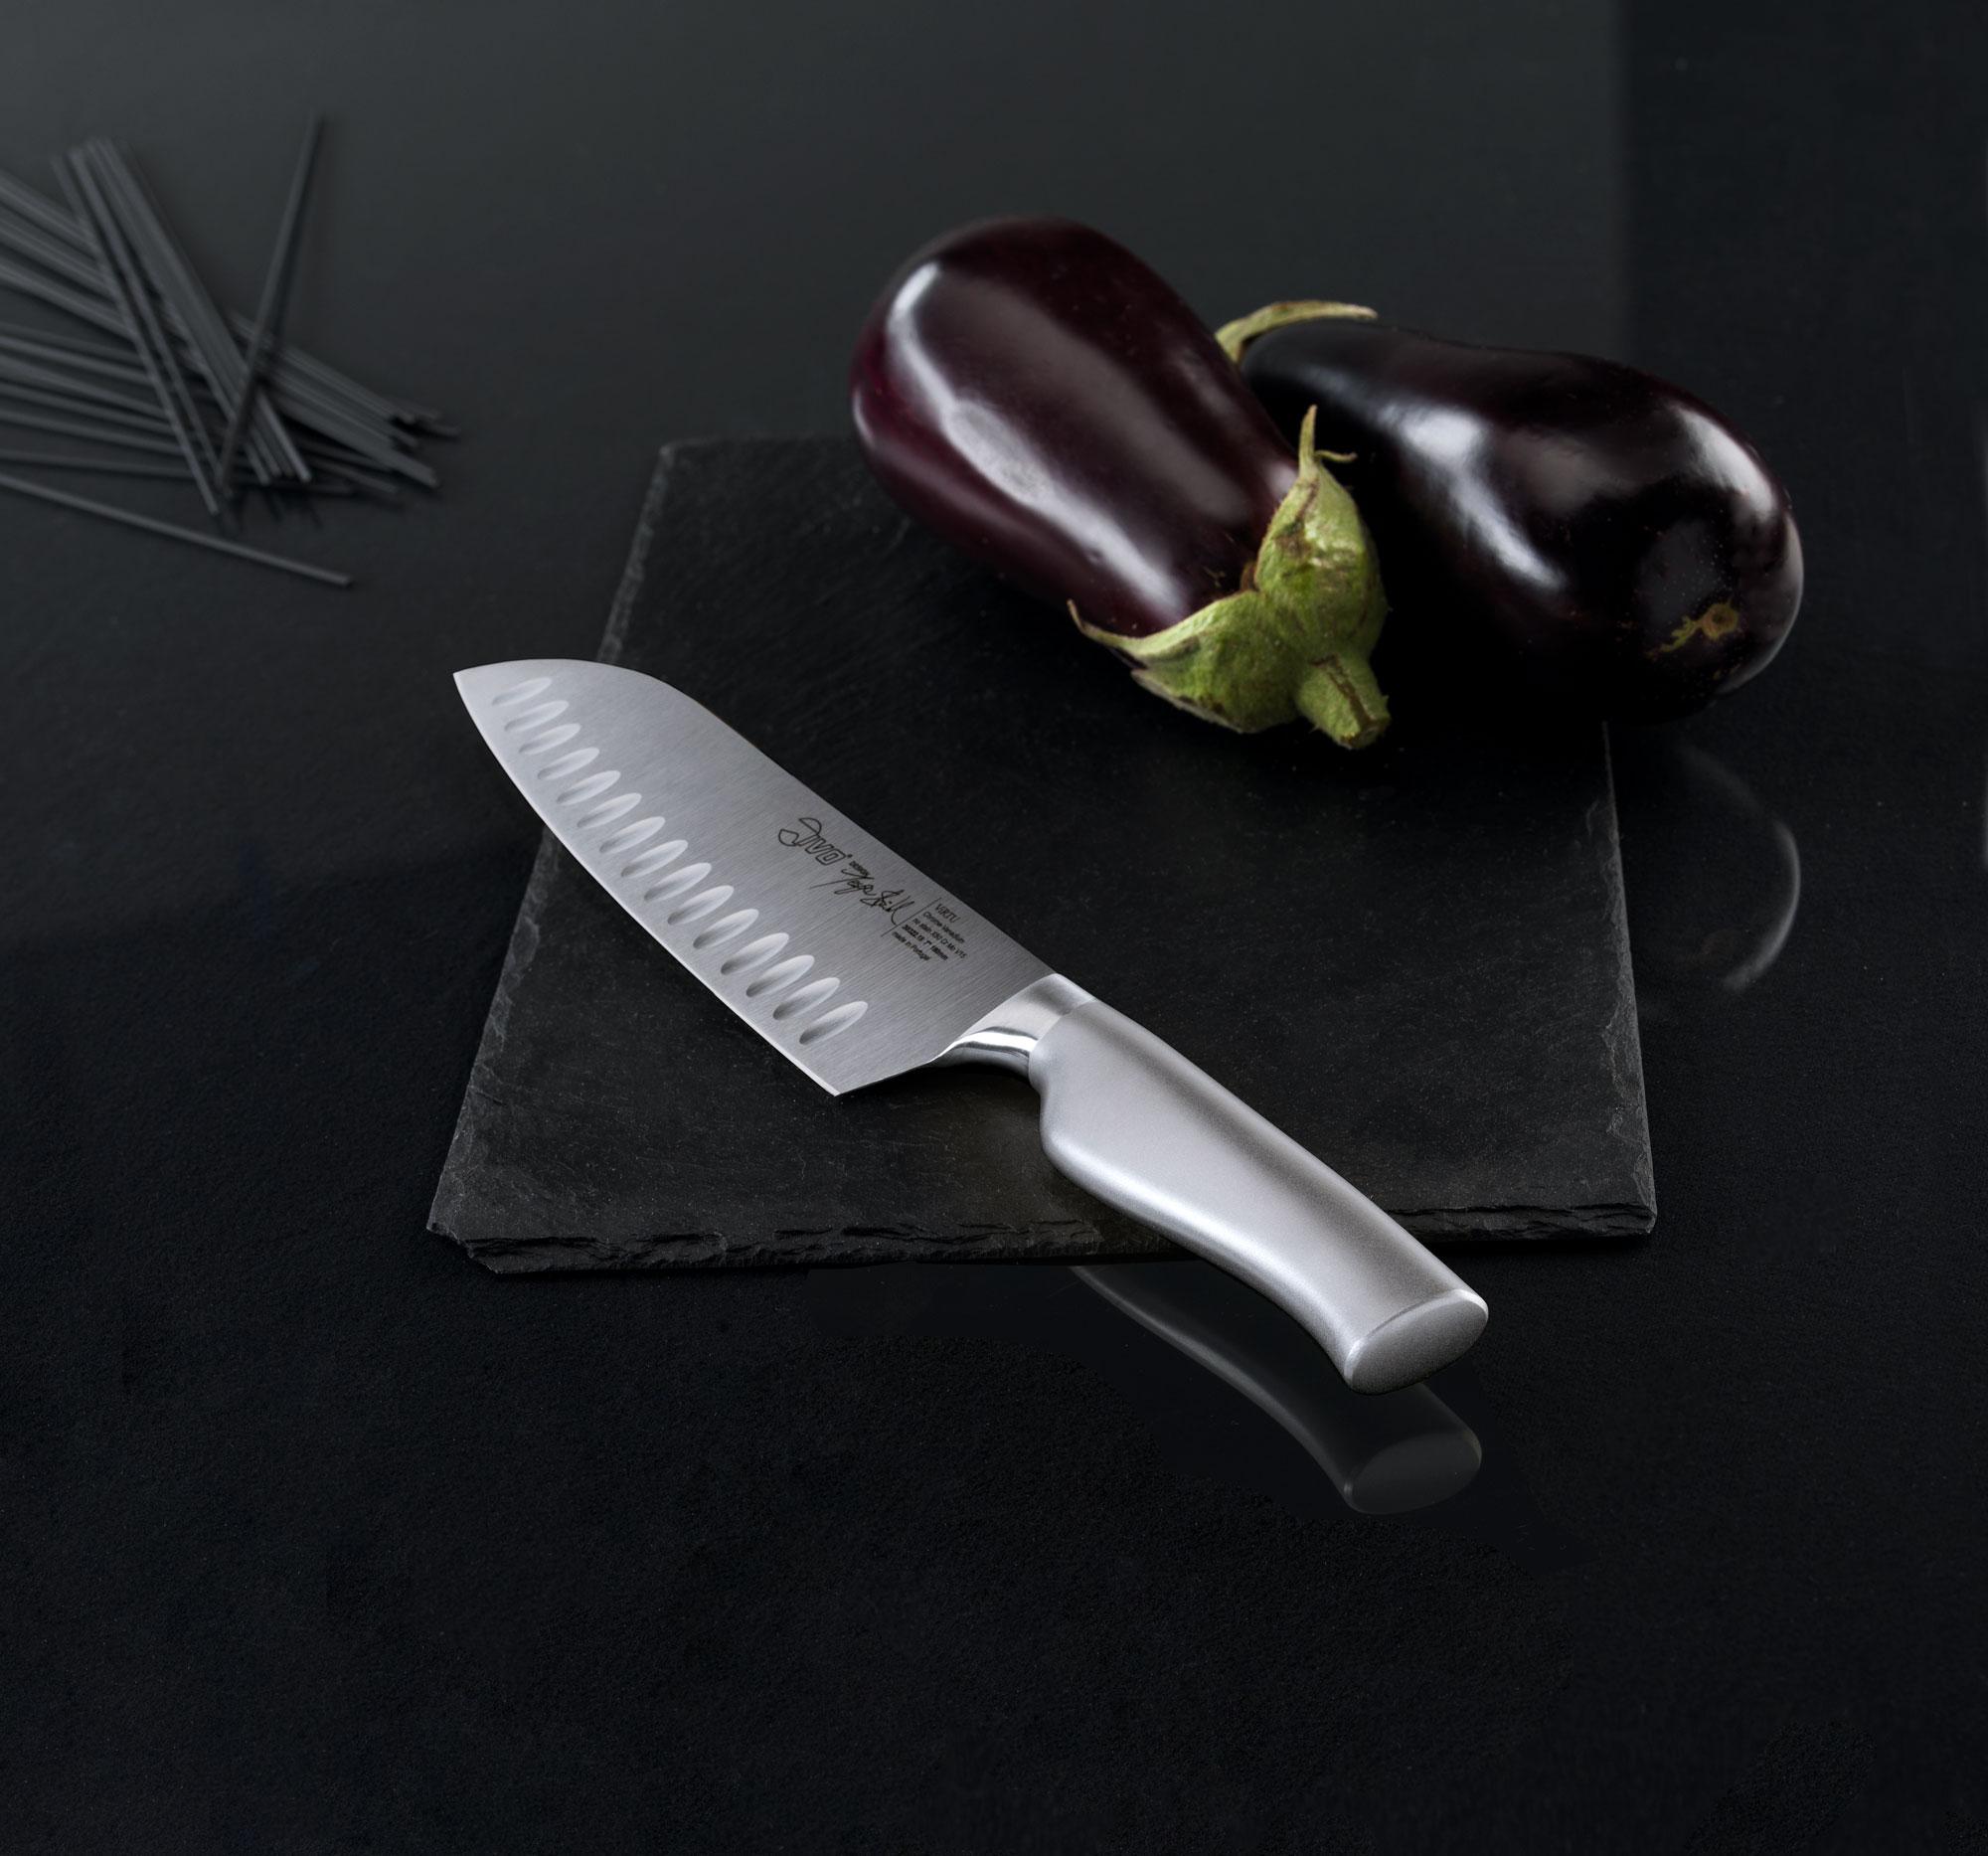 Nože IVO Cutelarias S.A. - kvalita vybrúsená tromi generáciami